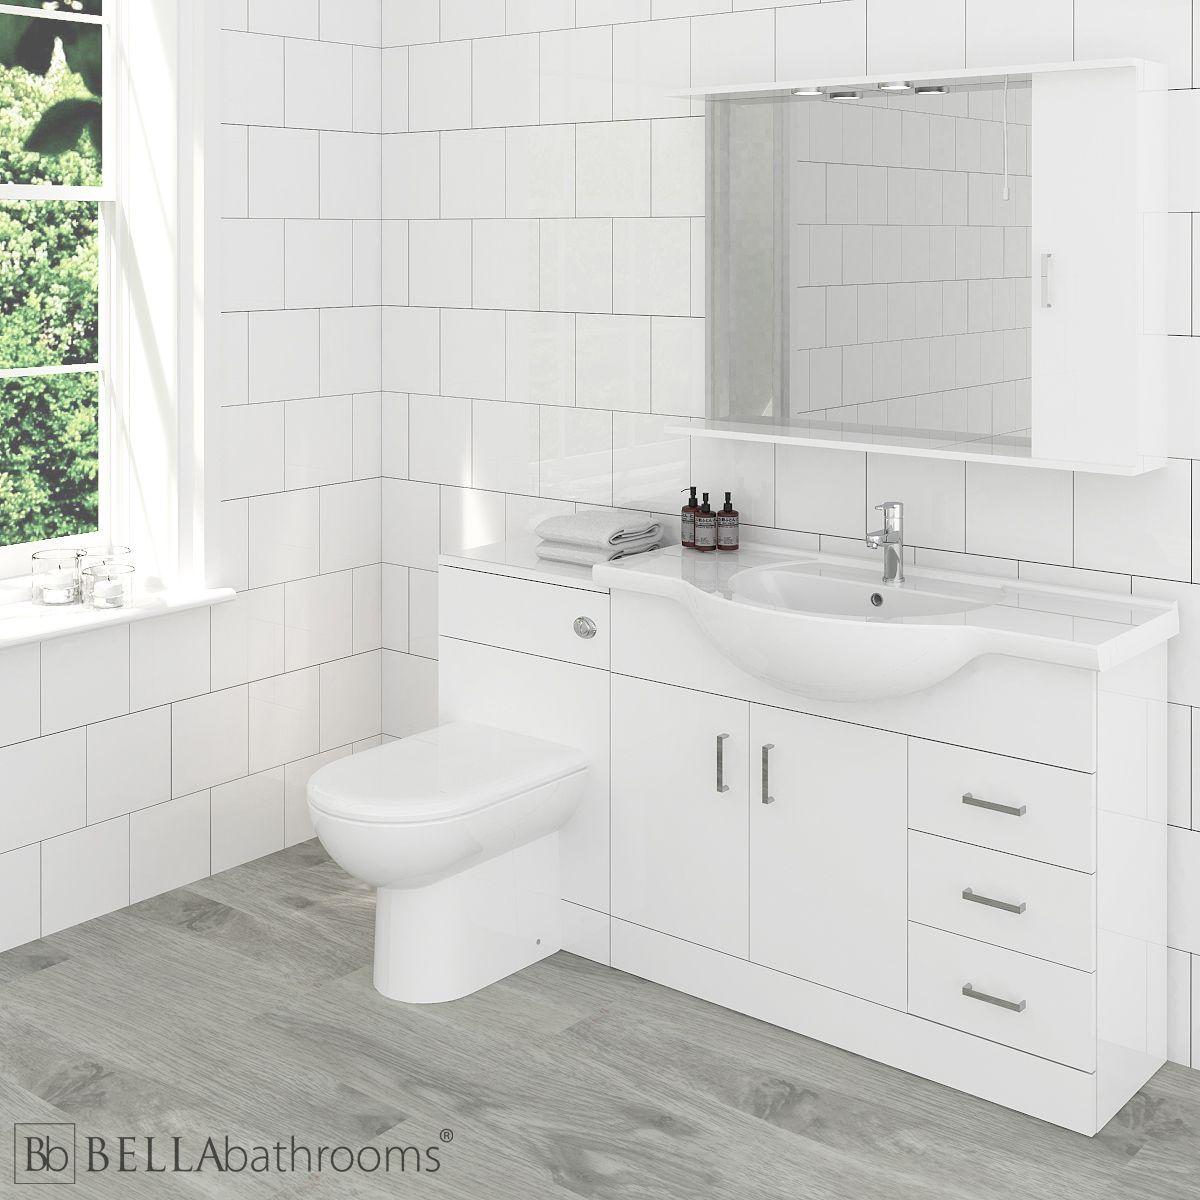 Bathroom Suite Single Ended Bath Vanity Unit Toilet Gloss White 1050mm Bathroom Fixtures Ecog Home Garden Store